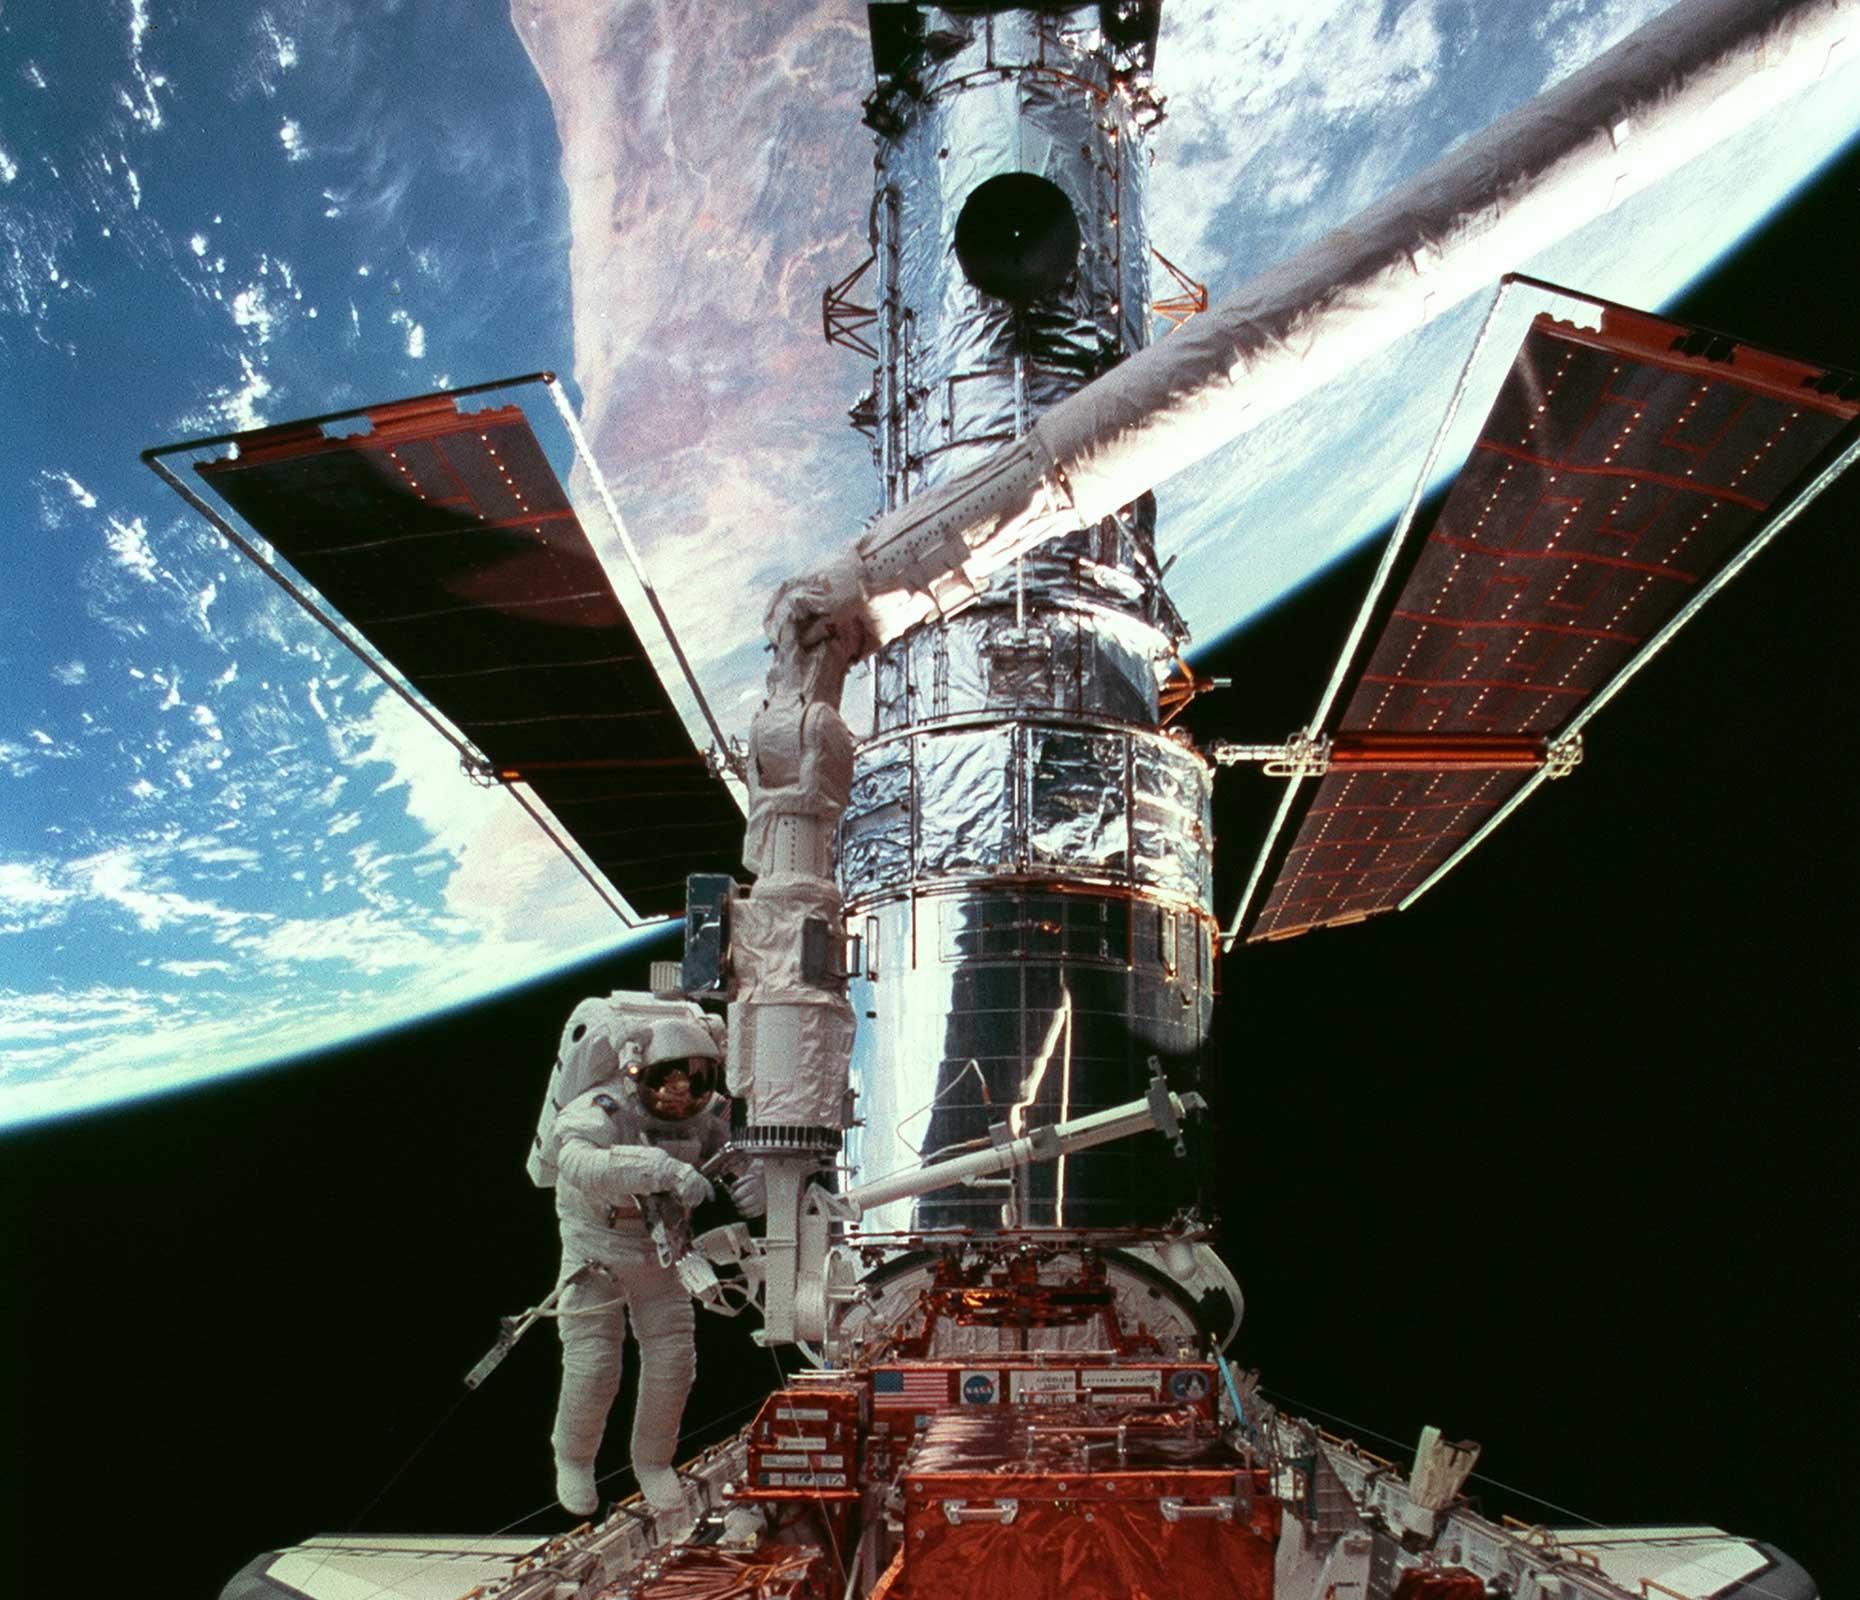 Hubble Space Telescope (Image: Courtesy of Steve Smith/NASA)